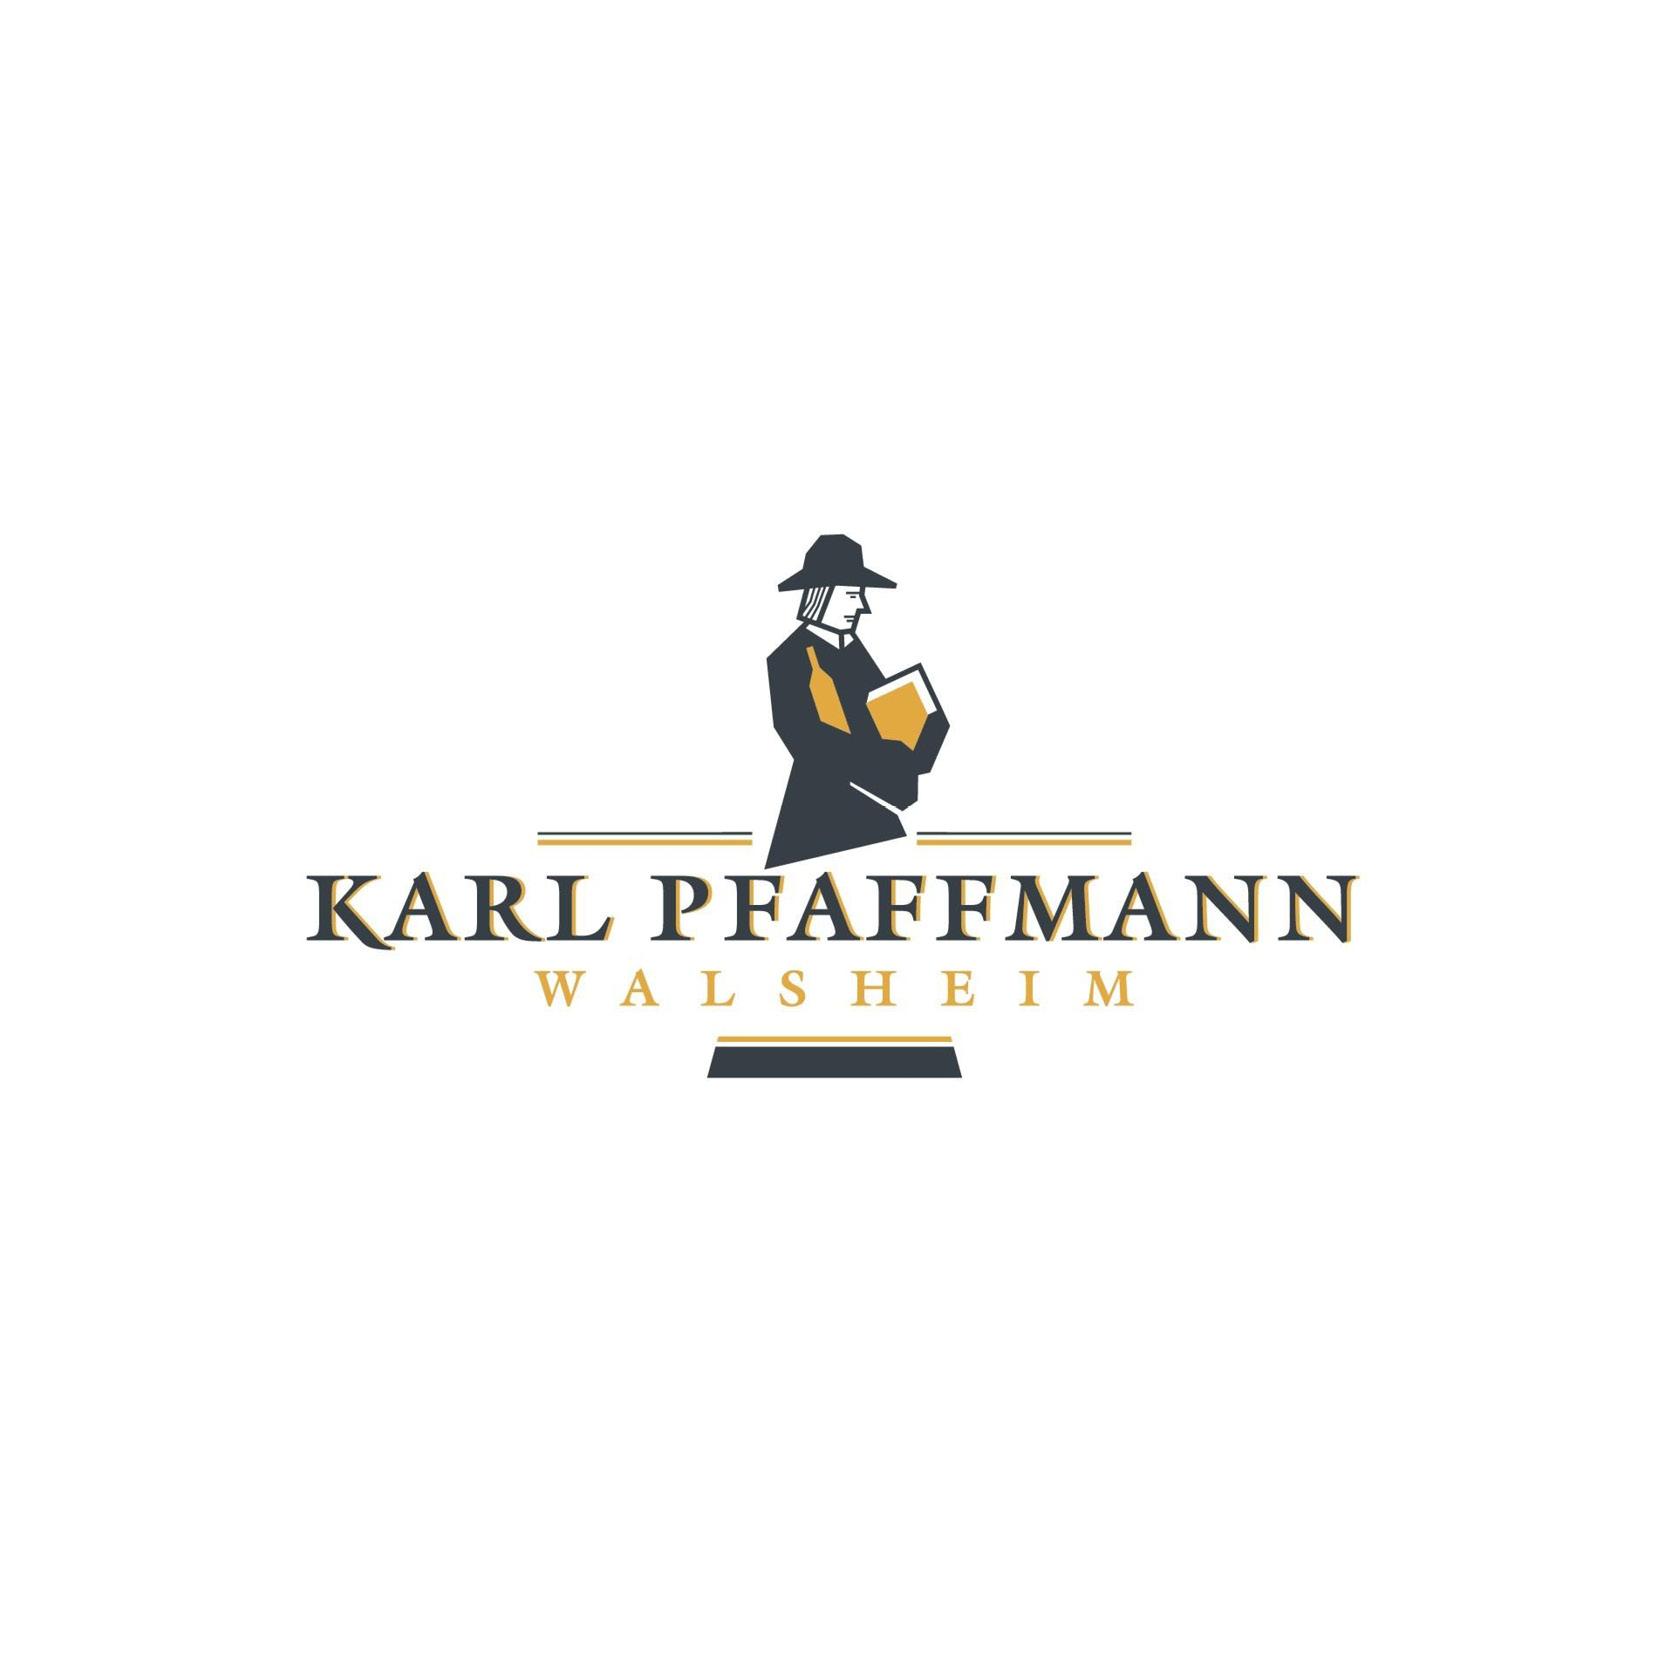 Karl Pfaffman